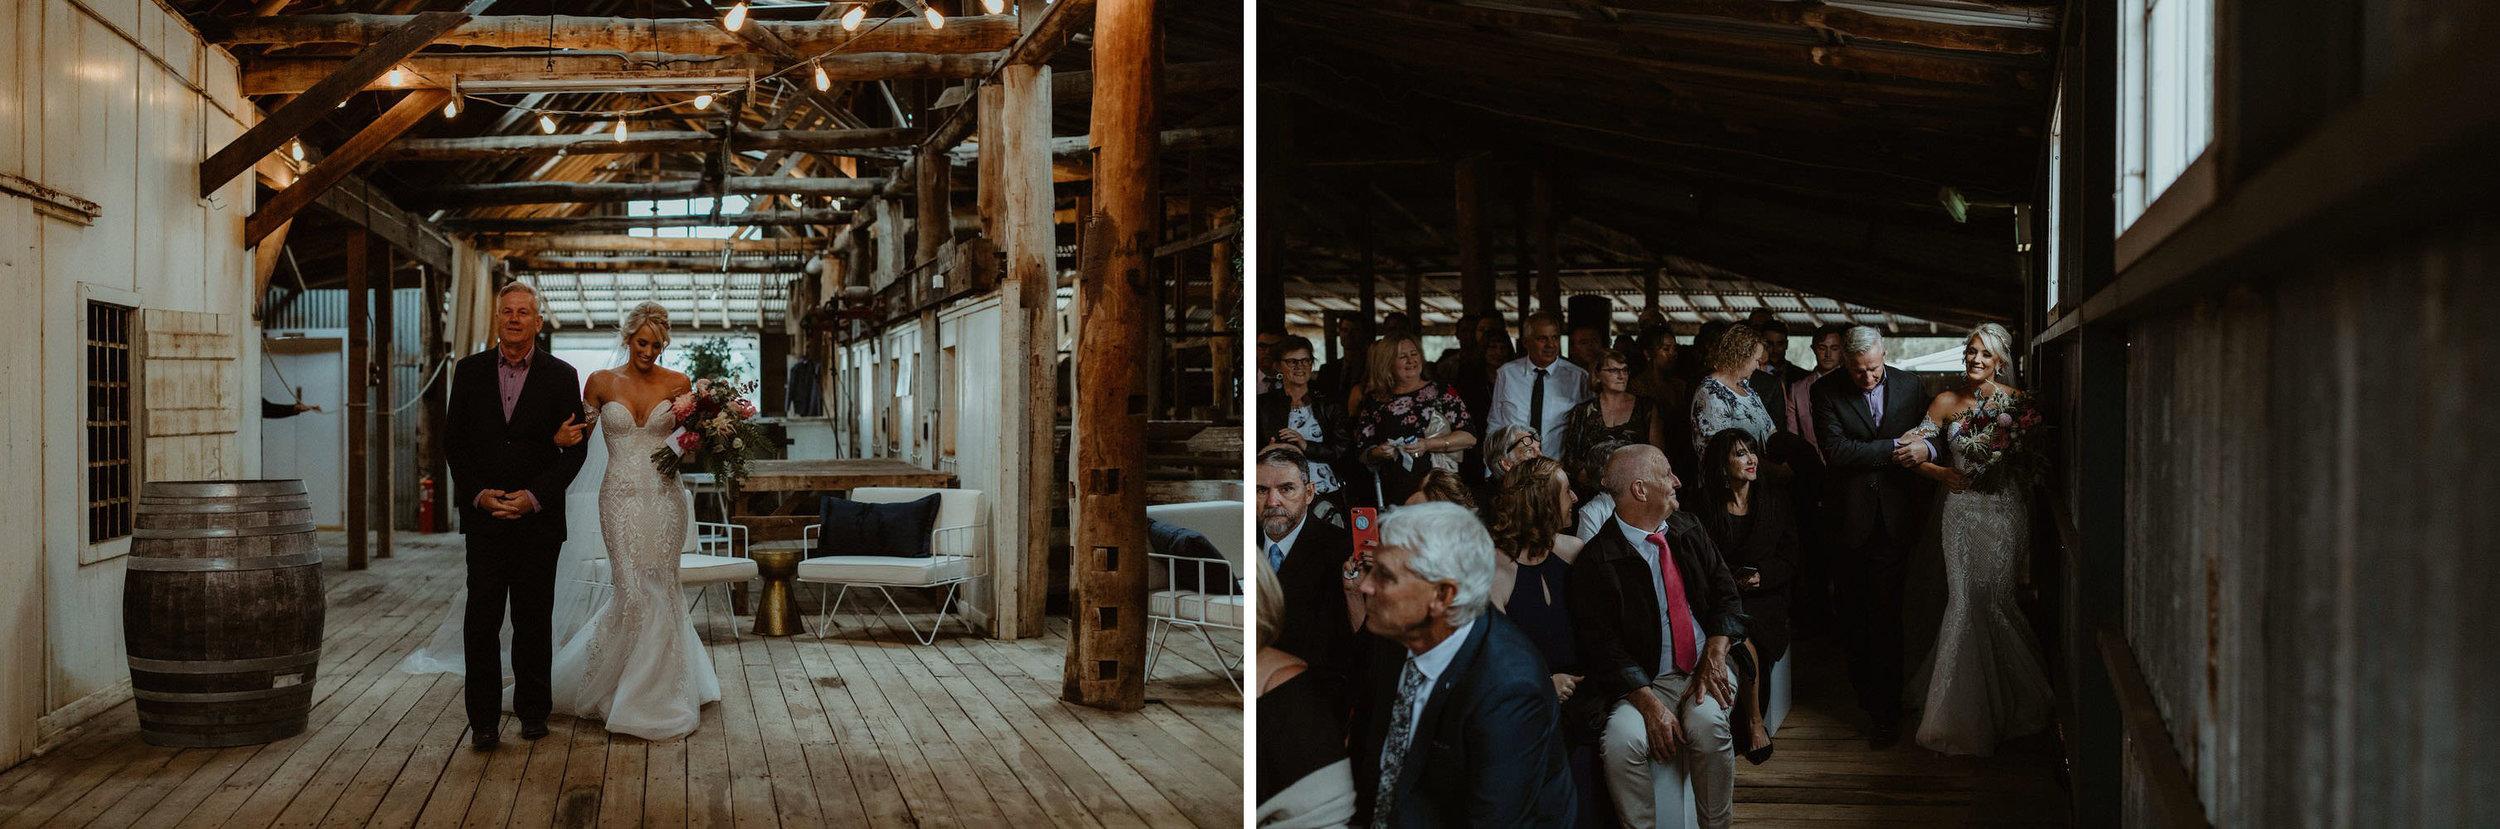 round-hill-homestead-culcairn-wedding-41.jpg